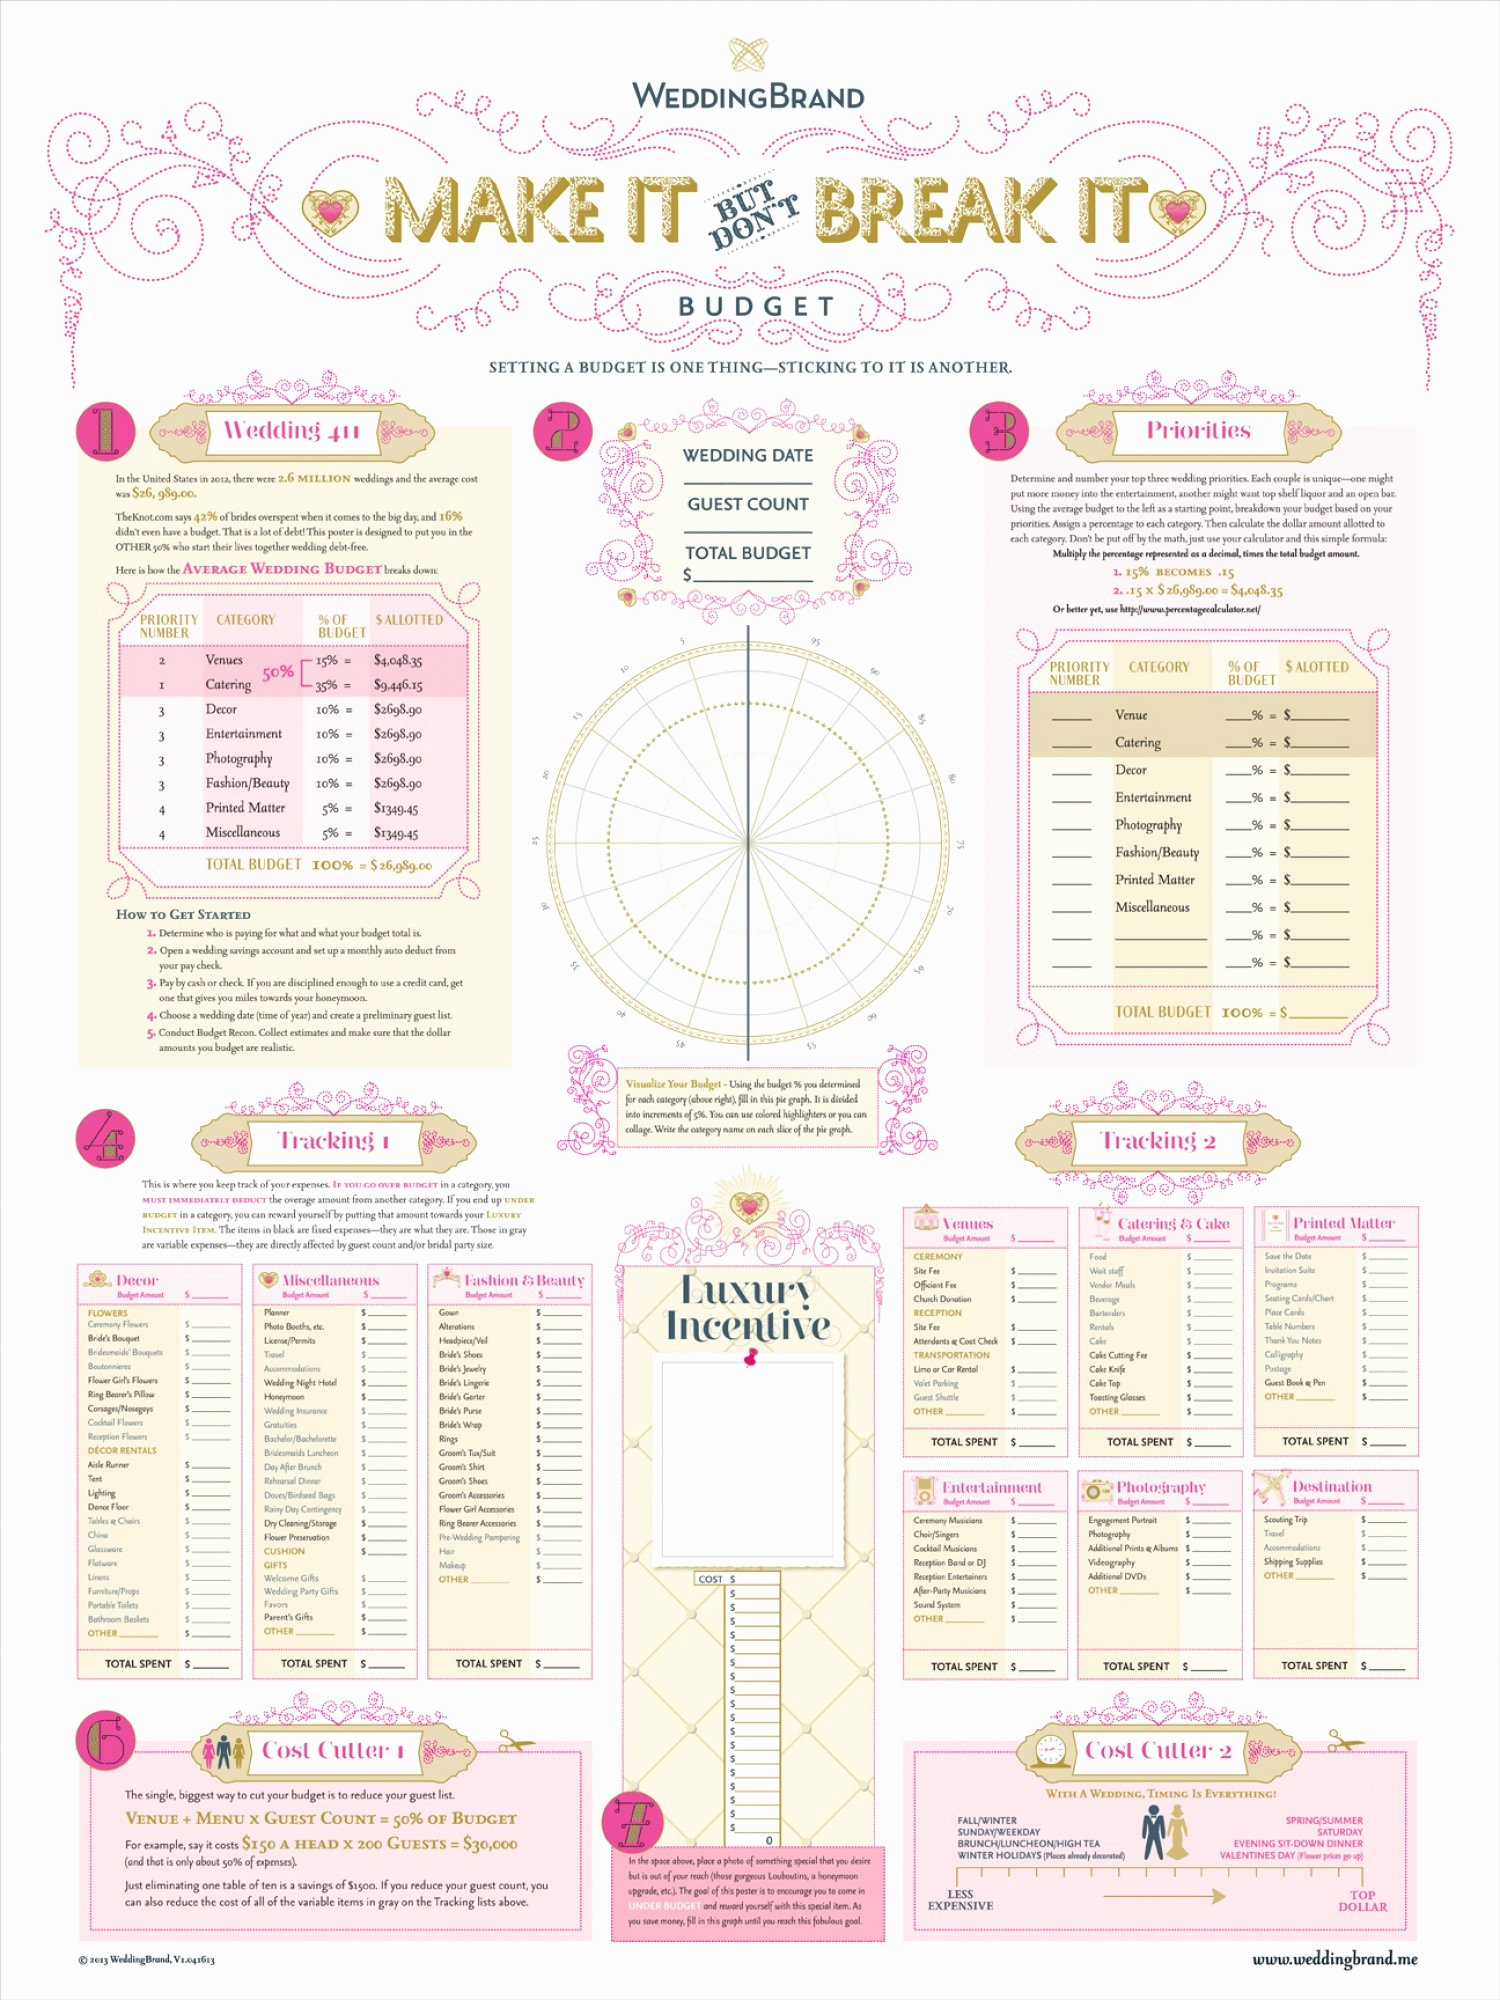 Wedding Planning Budget Template Inspirational Make It but Don't Break It Wedding Bud